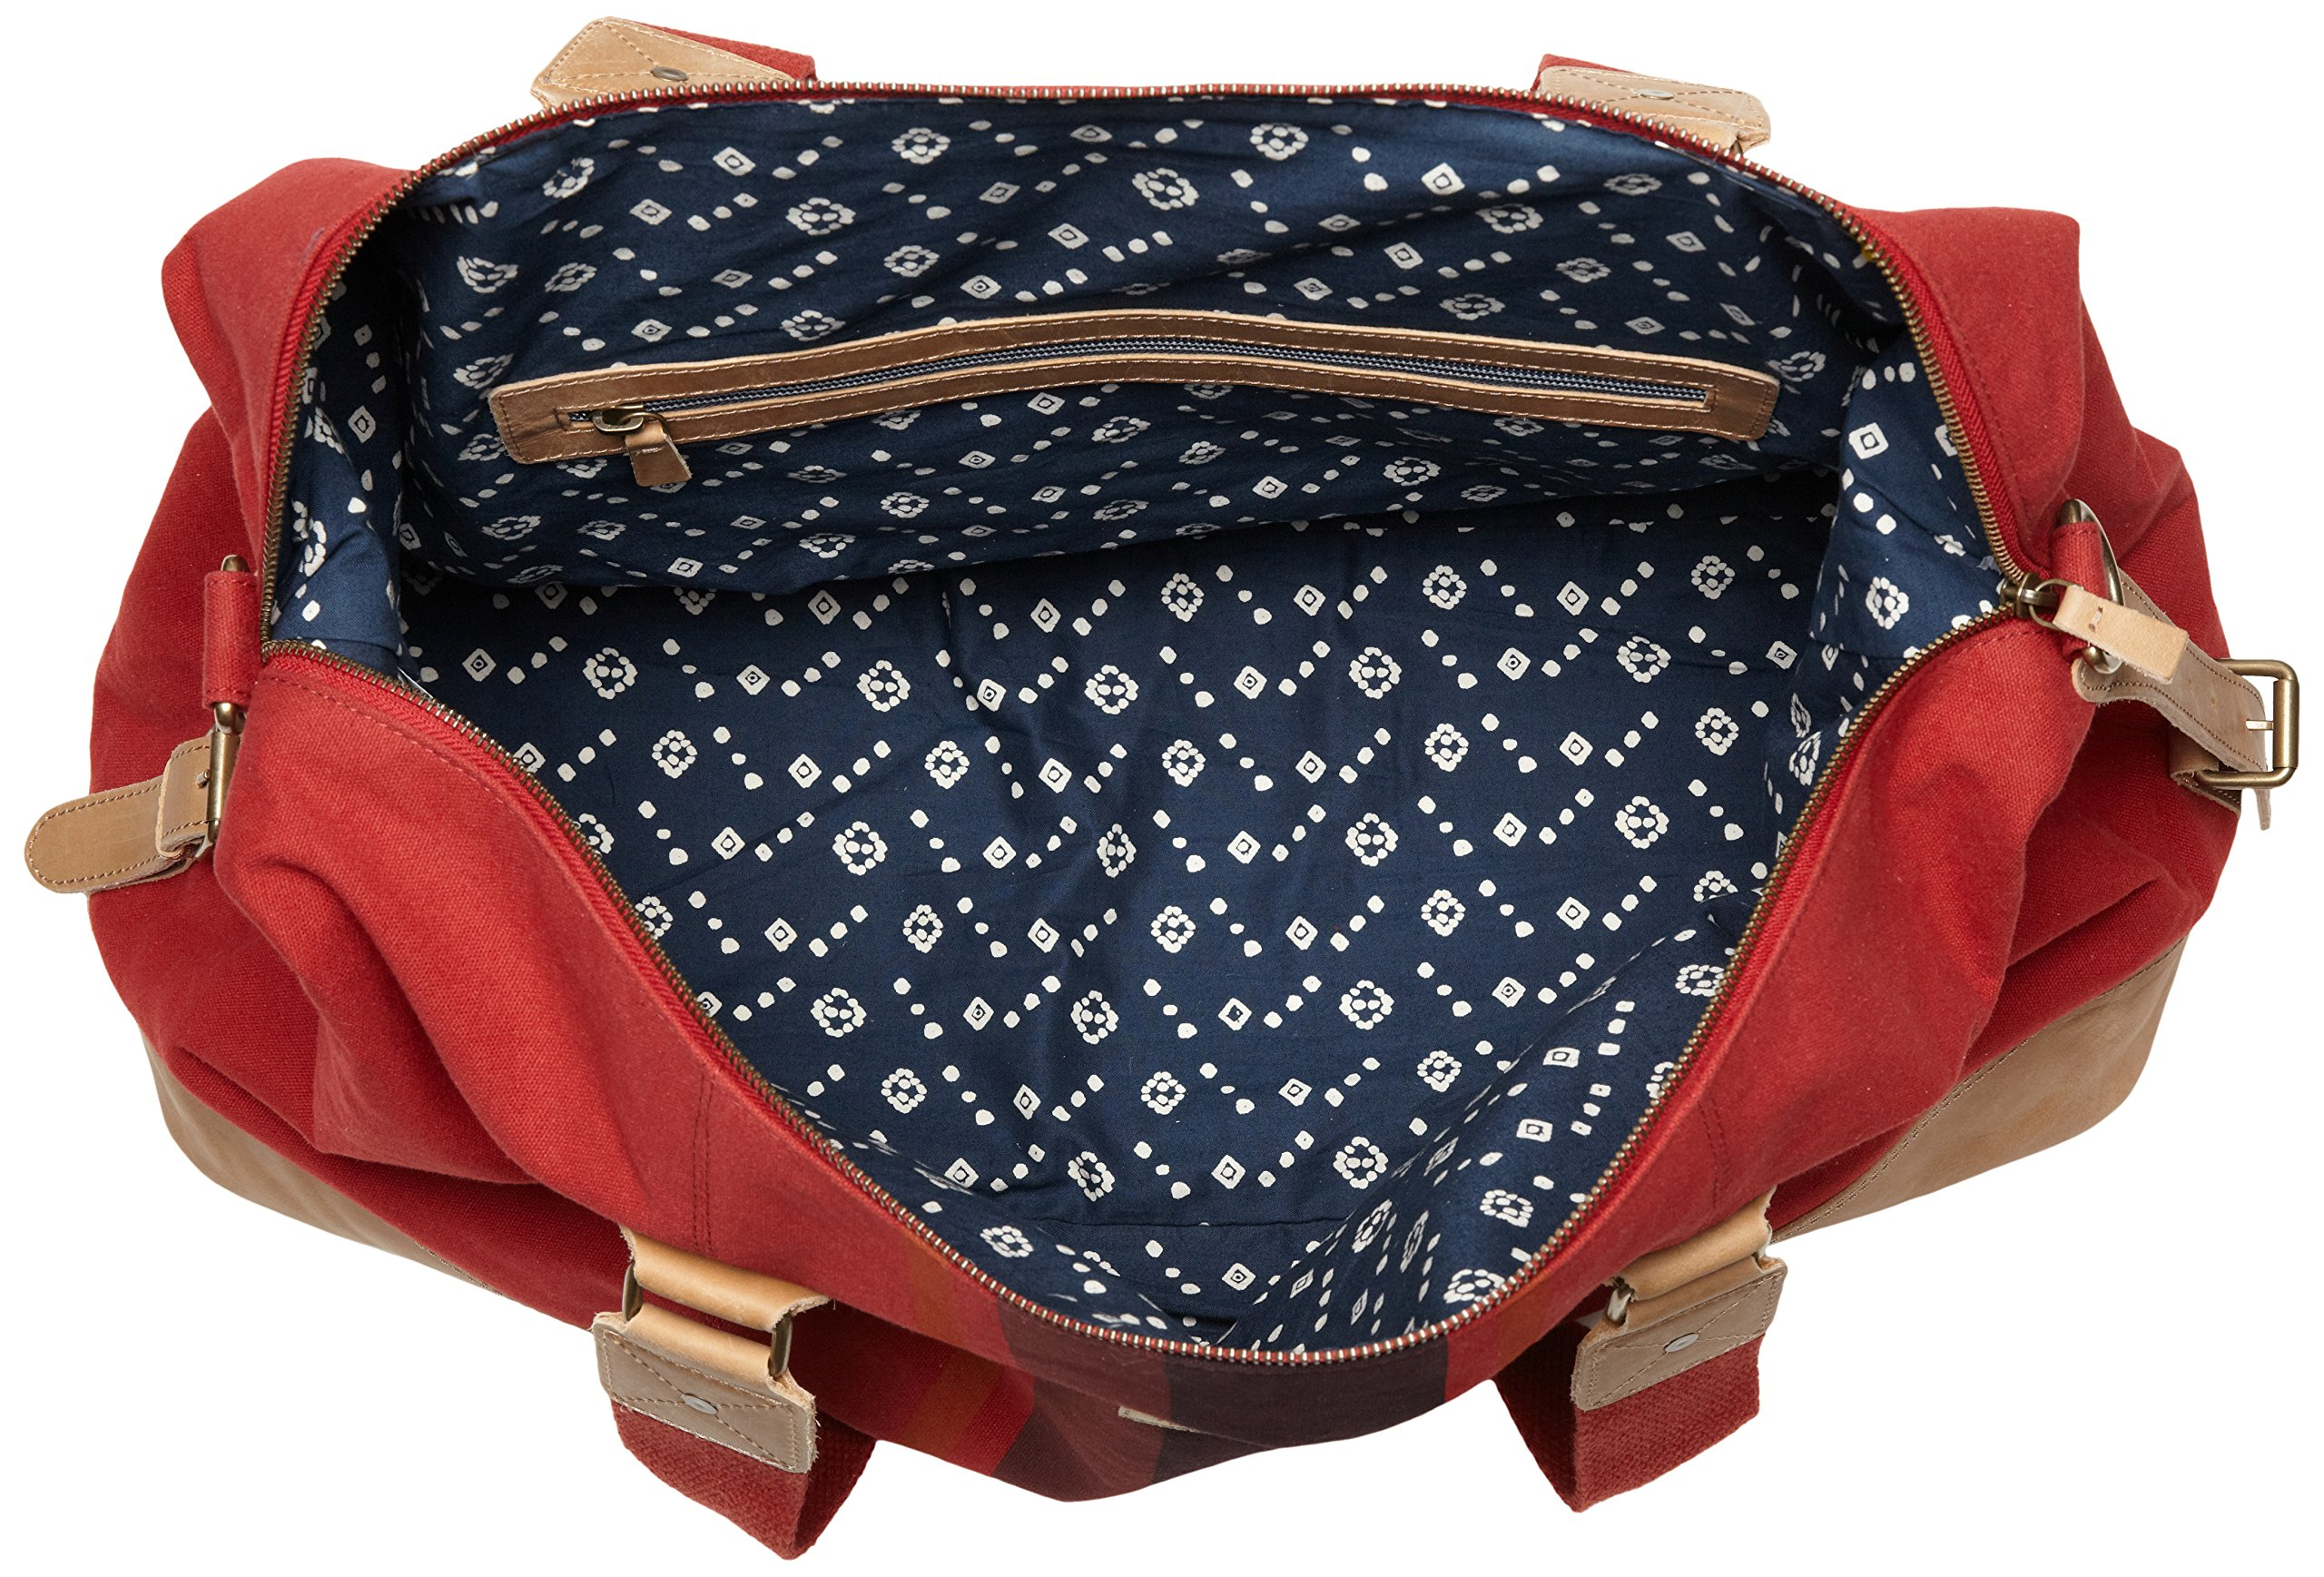 Original Penguin Men's Canvas Weekend Bag Duffel Bag, Pompeian Red, One Size by Original Penguin (Image #5)